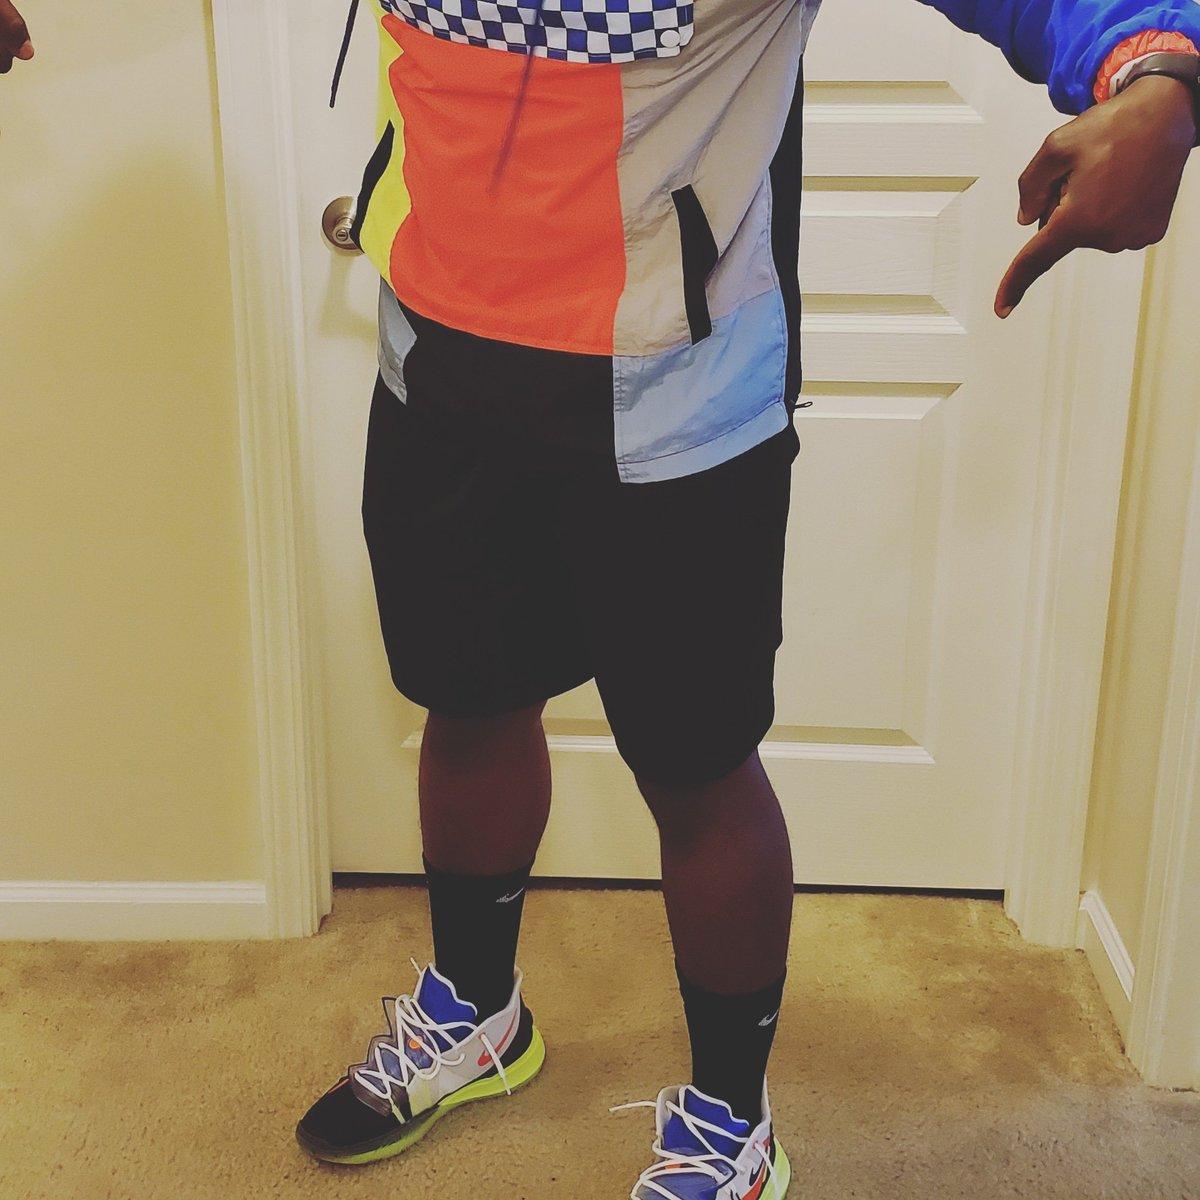 Perfect jacket for the kicks!#regularsneakerguy #nike #kyrie5rokit #kicksonfire🔥#nicekicks #sneakerbardetroit #goatapp #stockx